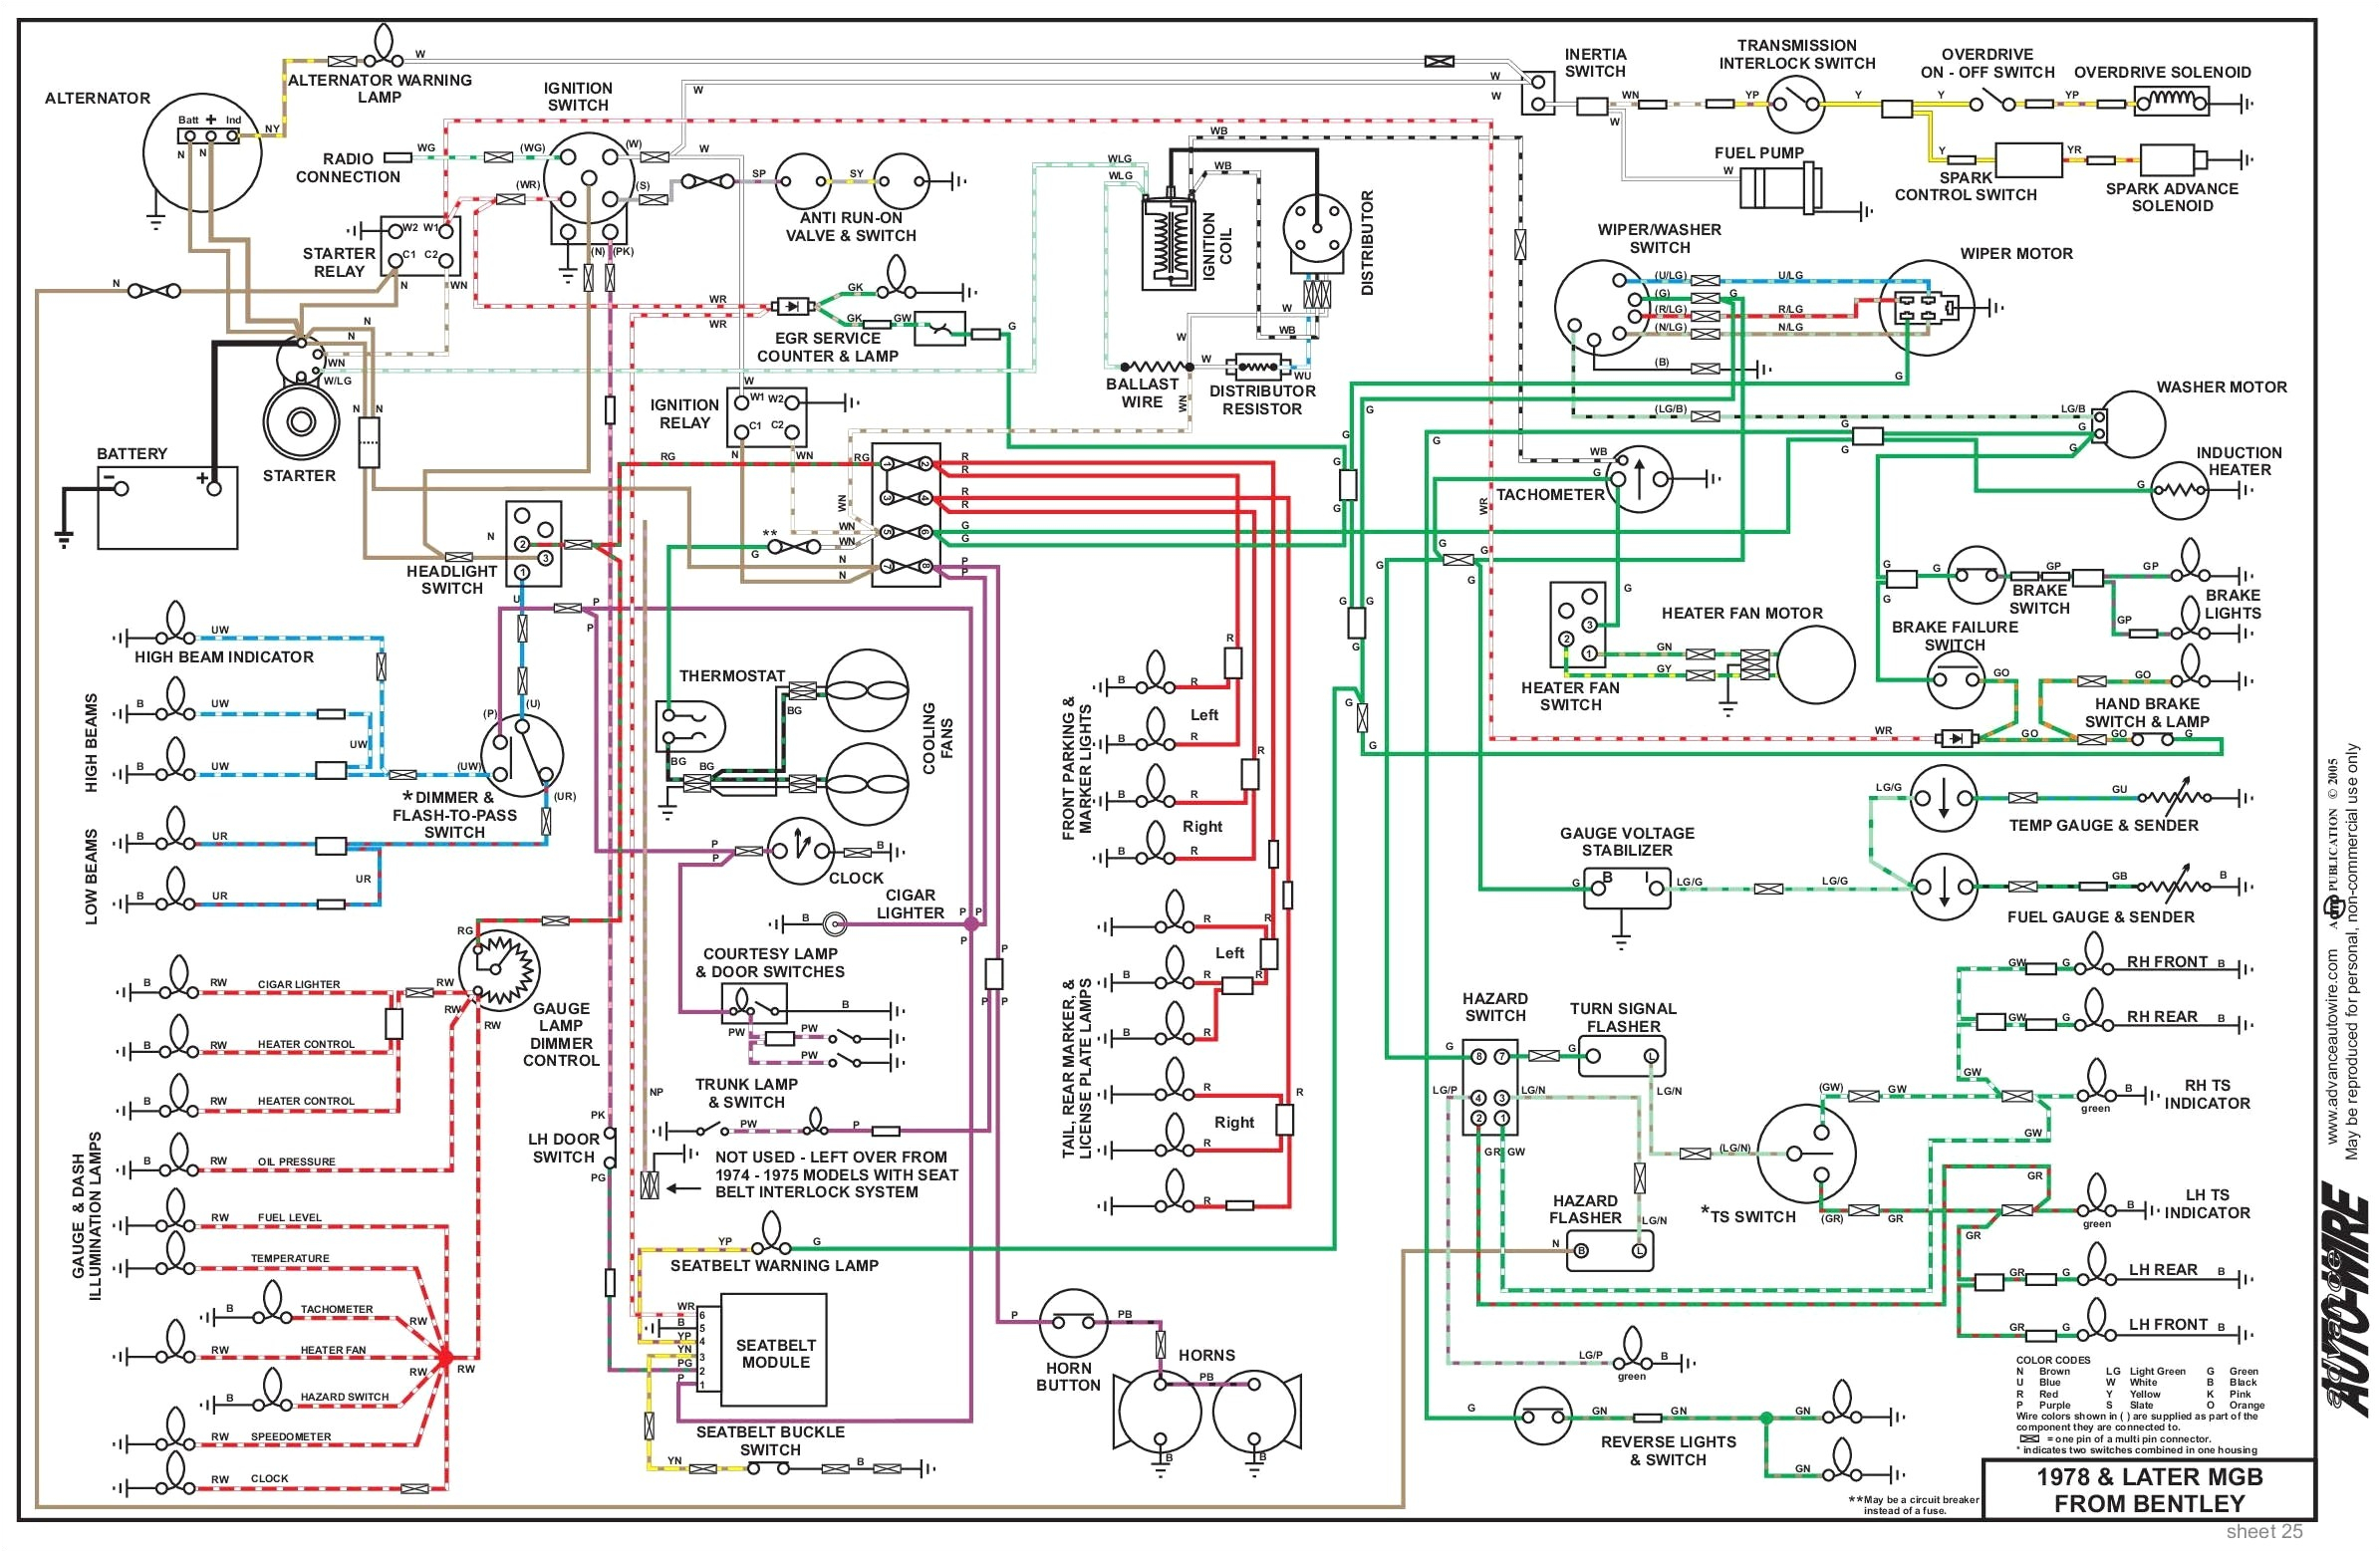 1976 mgb wiring diagram wiring diagram for you 1976 mgb wiring diagram w cat 1976 mgb wiring diagram od